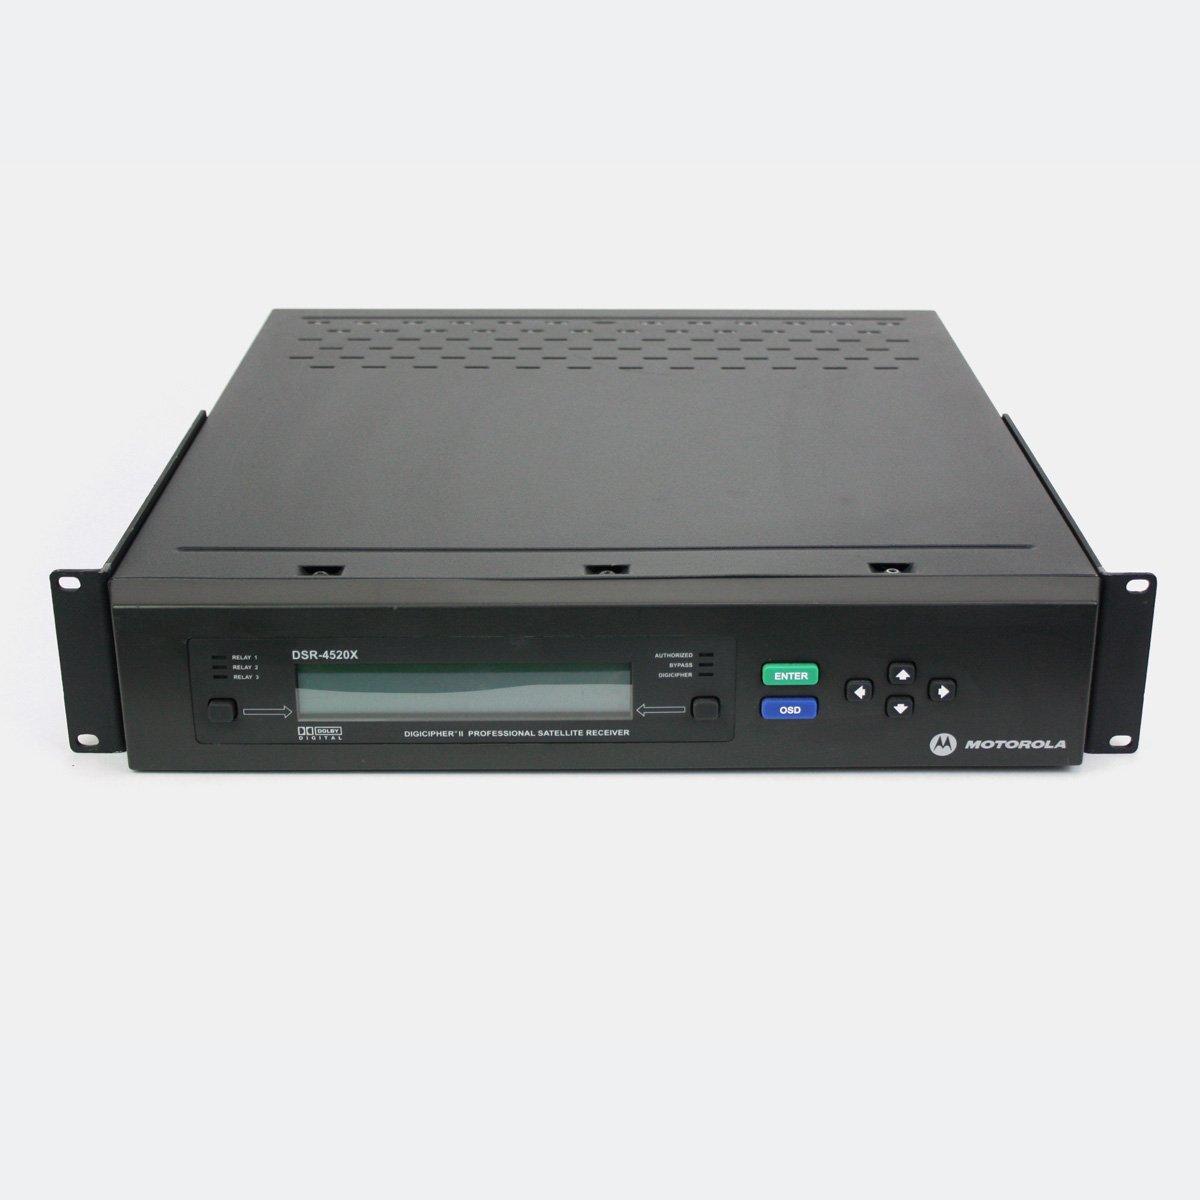 Used Motorola DSR-4520X Professional Satellite Receiver